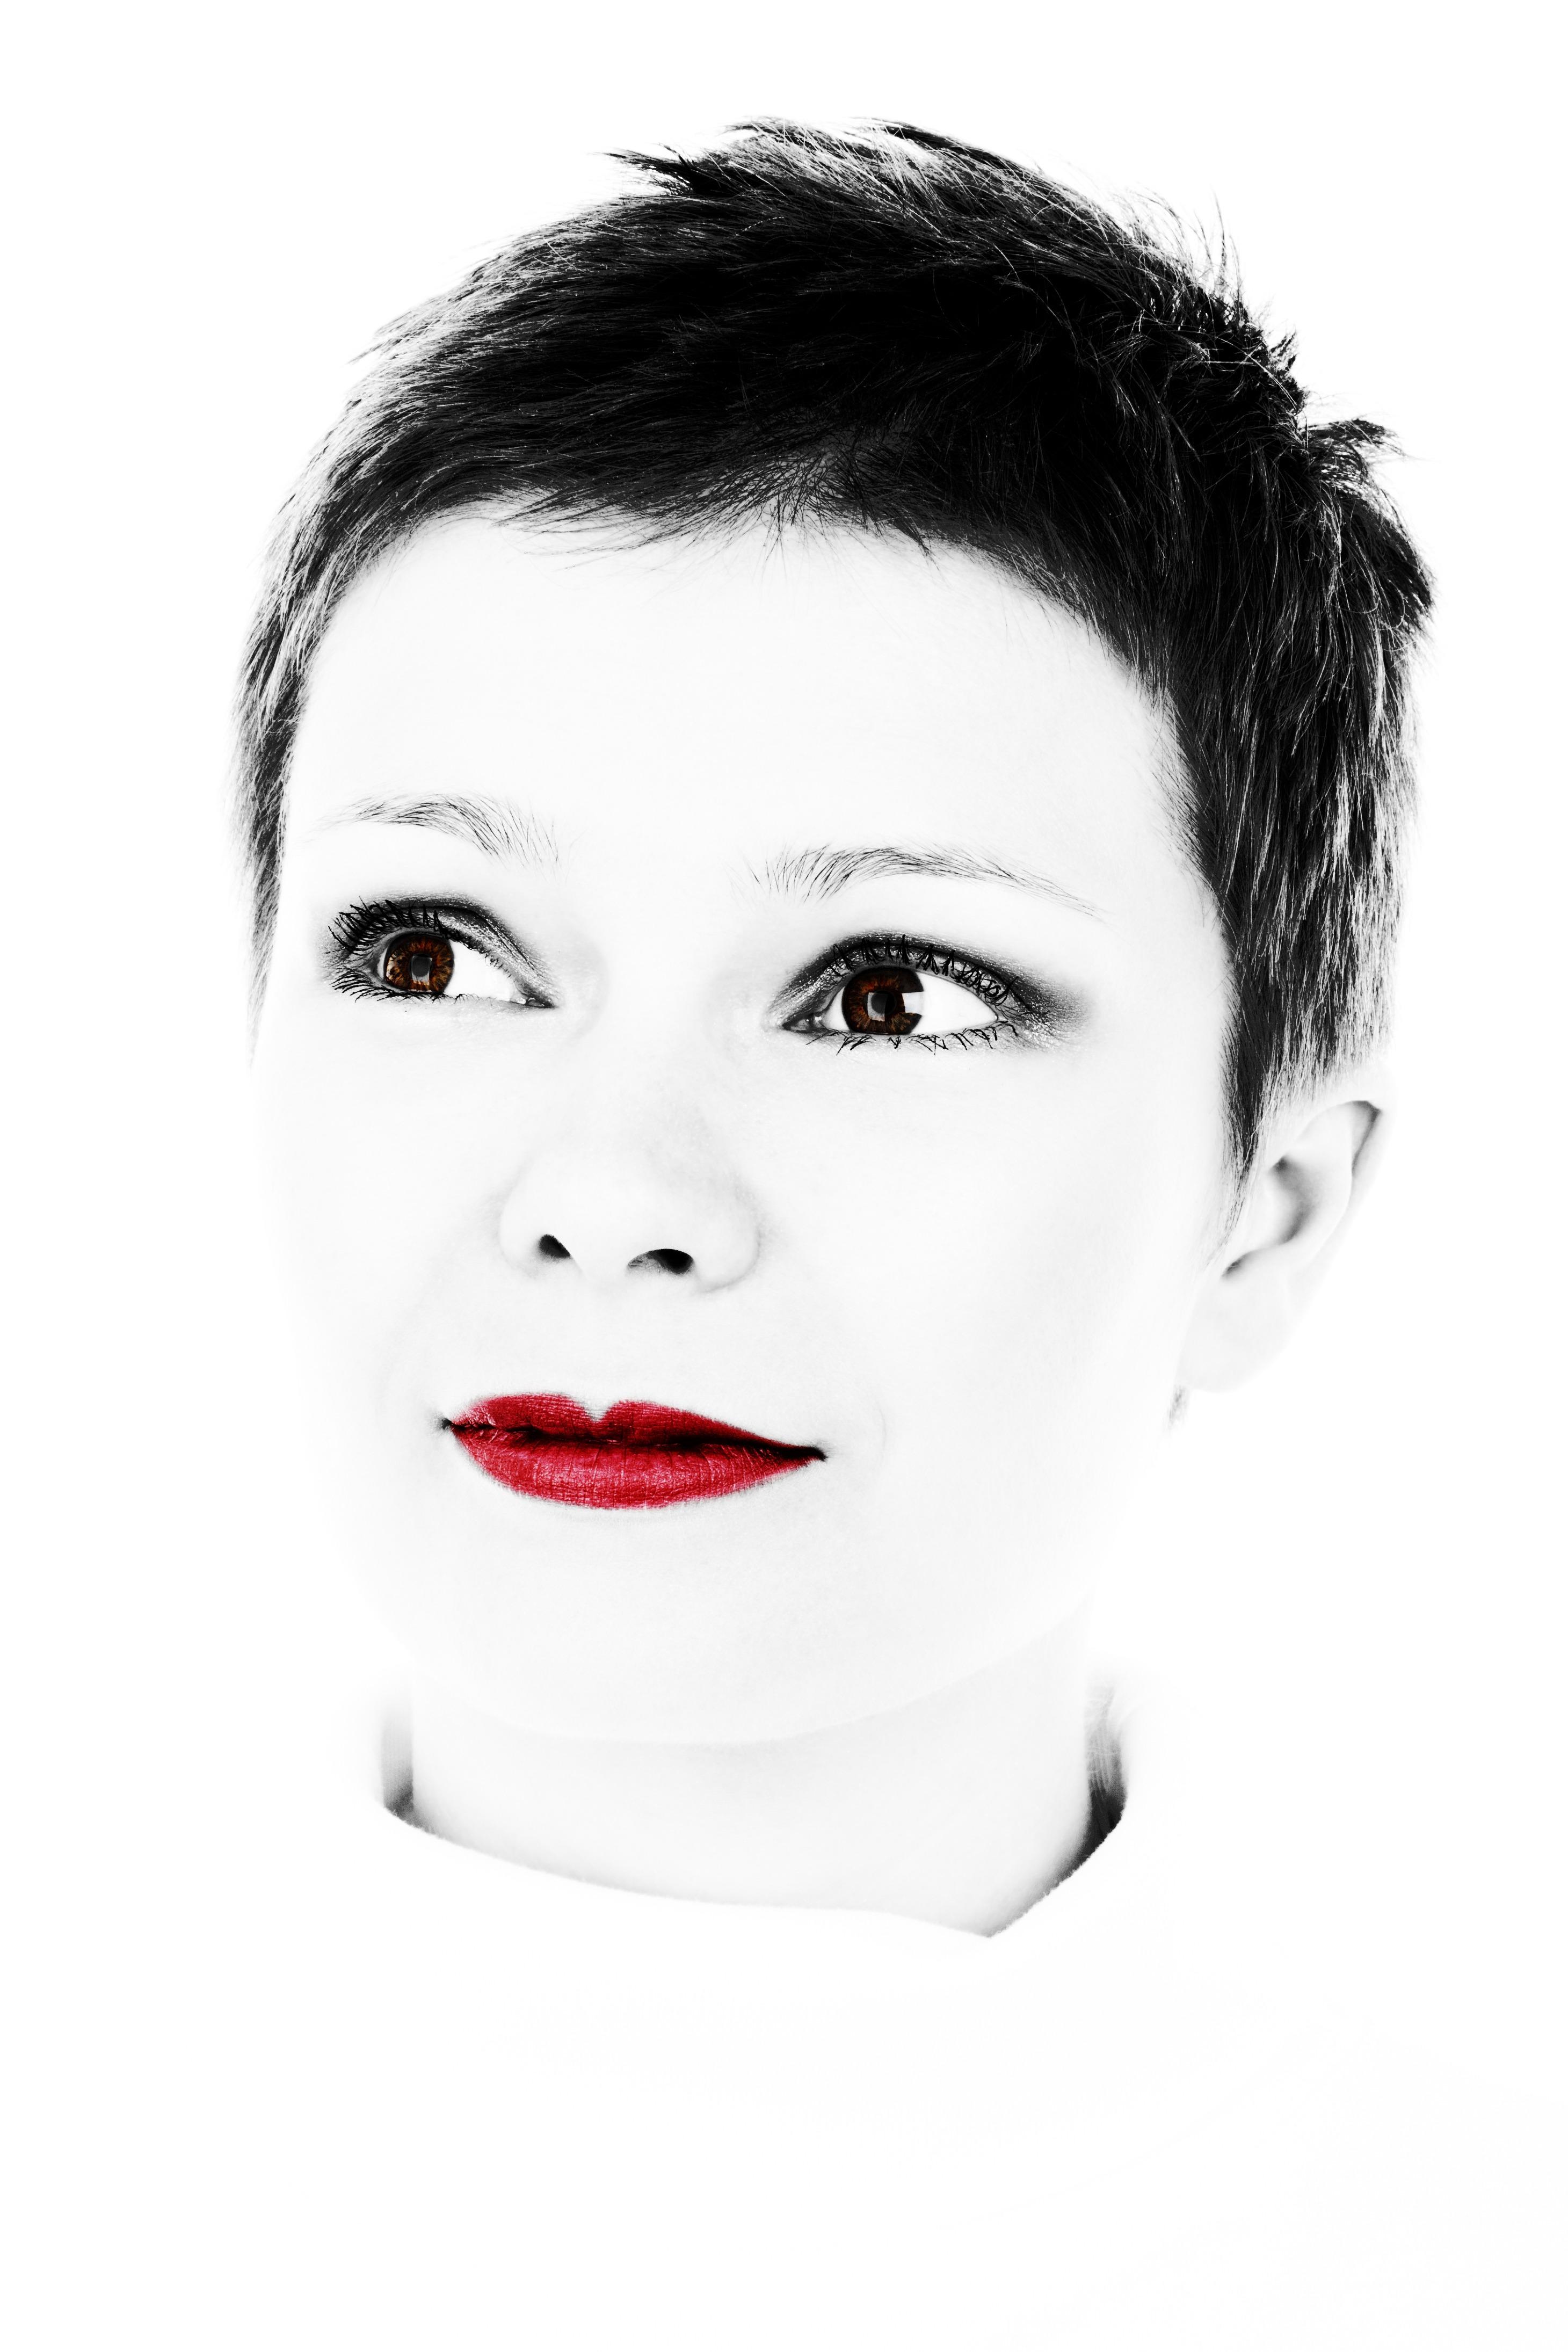 Gambar Orang Hitam Dan Putih Gadis Wanita Rambut Terpencil